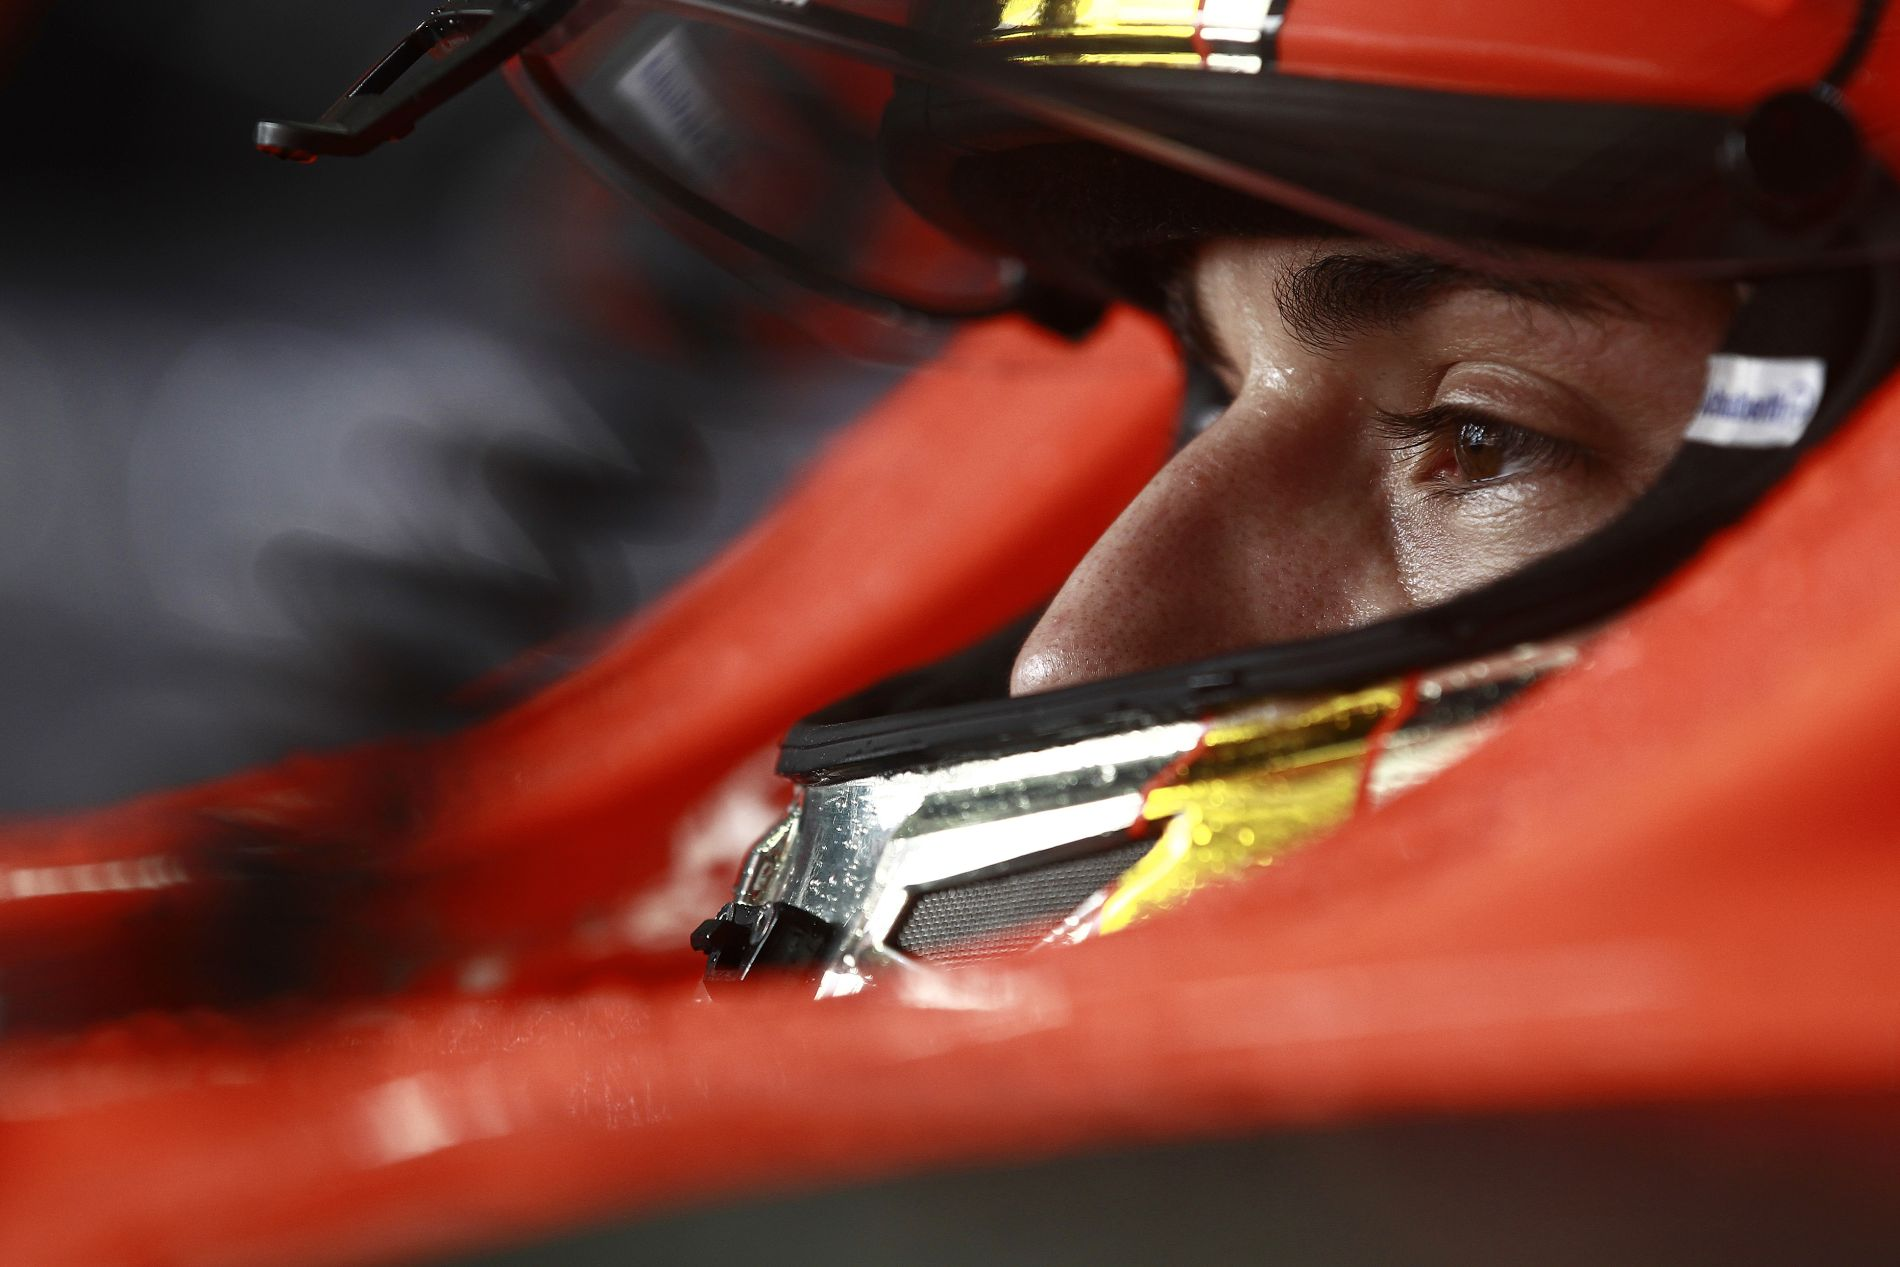 Ma lenne 26 éves Jules Bianchi